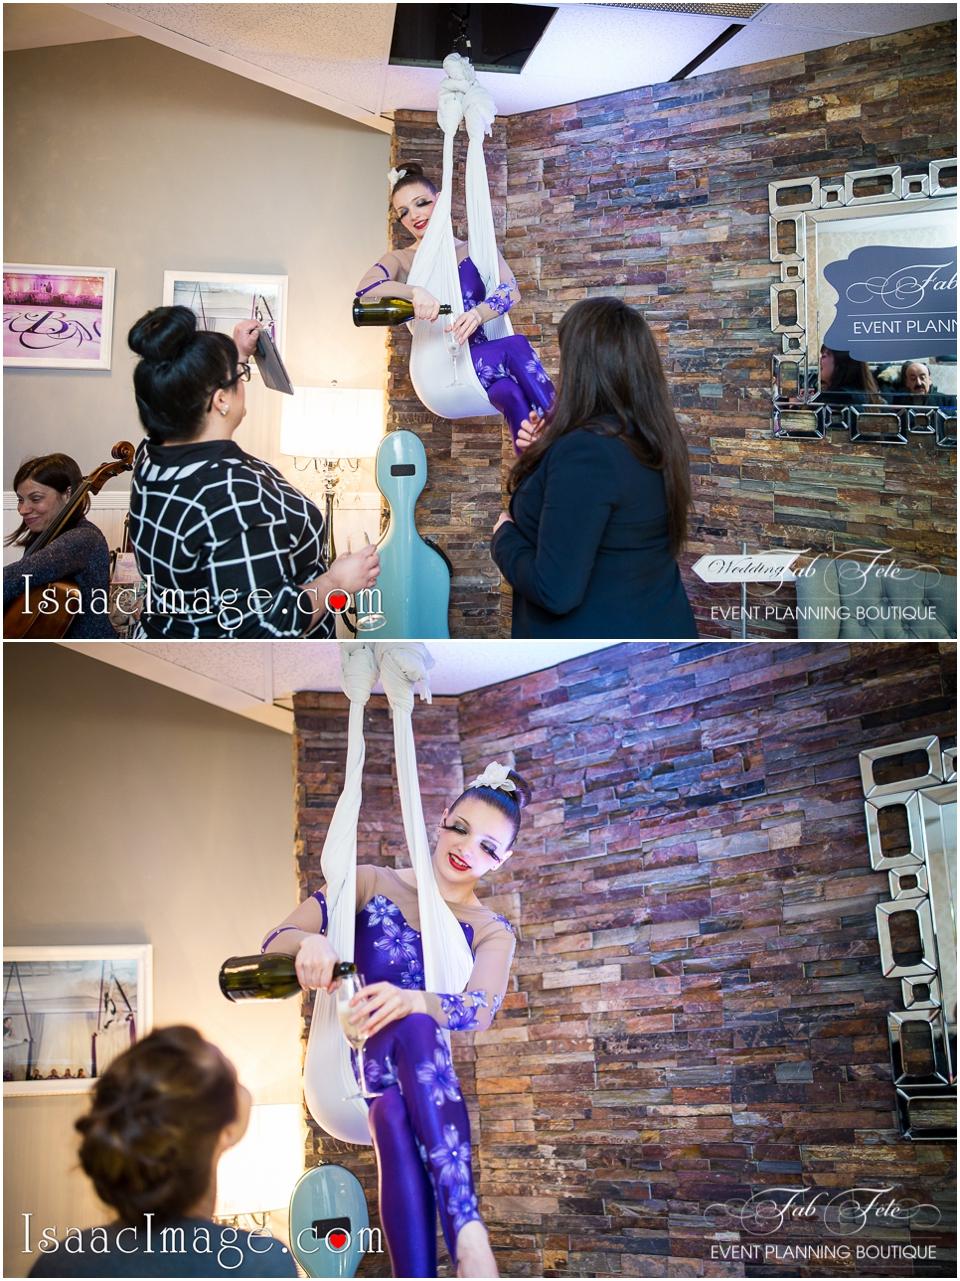 Fab Fete Toronto Wedding Event Planning Boutique open house_6457.jpg